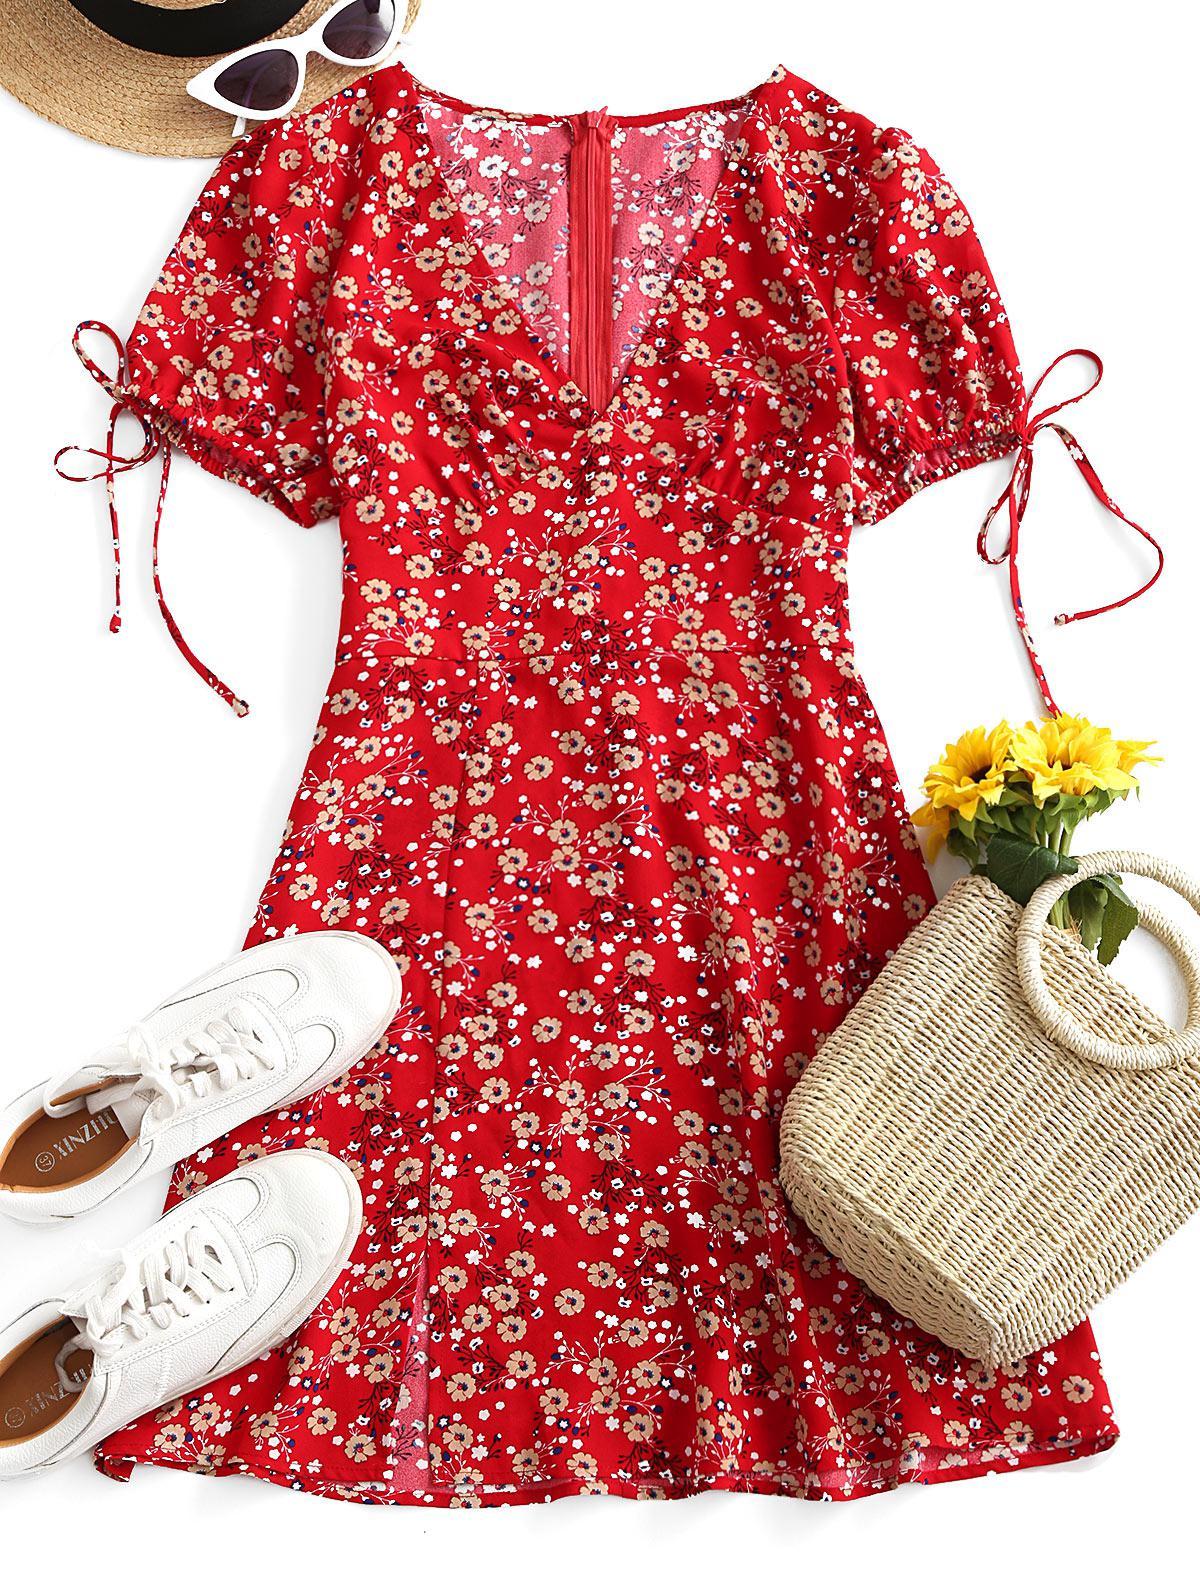 ZAFUL Floral Print Knotted Slit Flare Dress